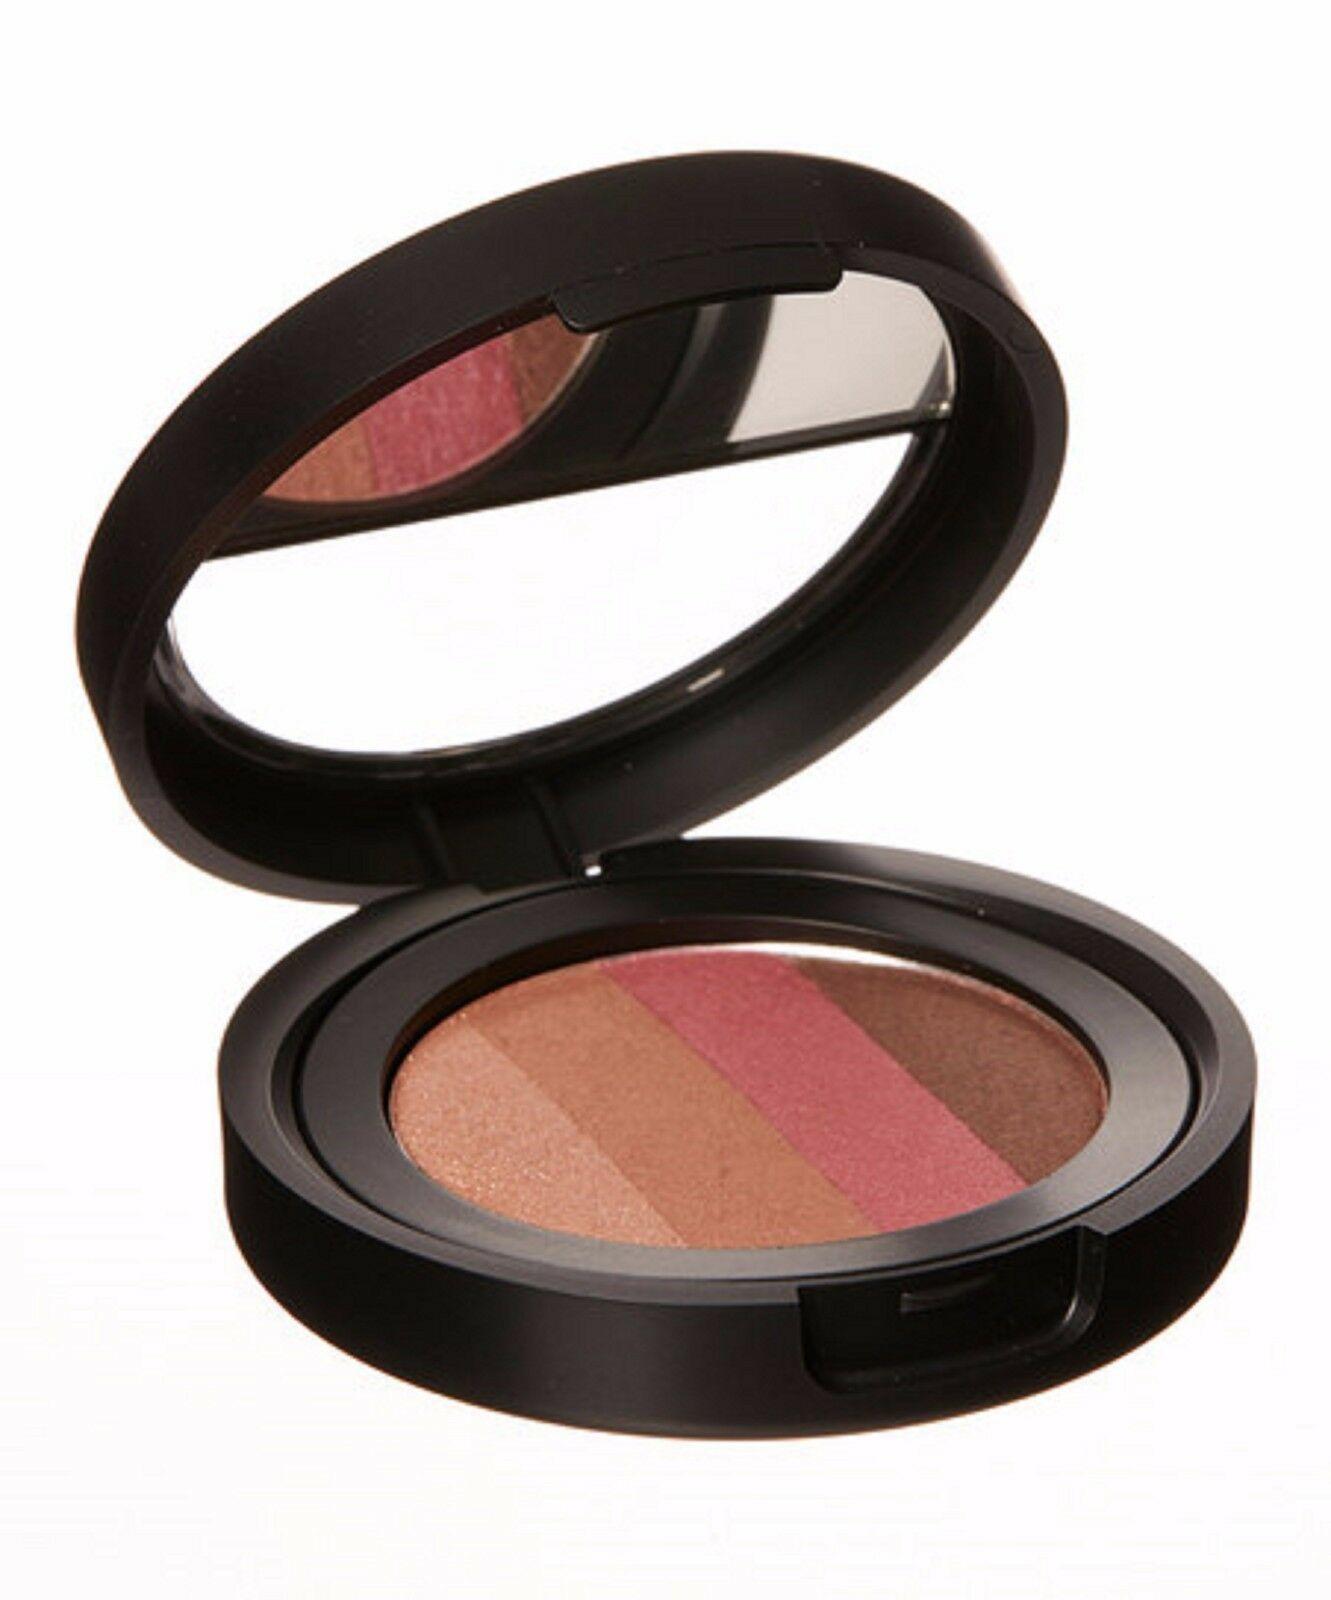 Laura Geller Baked Eye Dreams Pink Sunset .18oz Eye Shadow Quad Brand New - $8.99